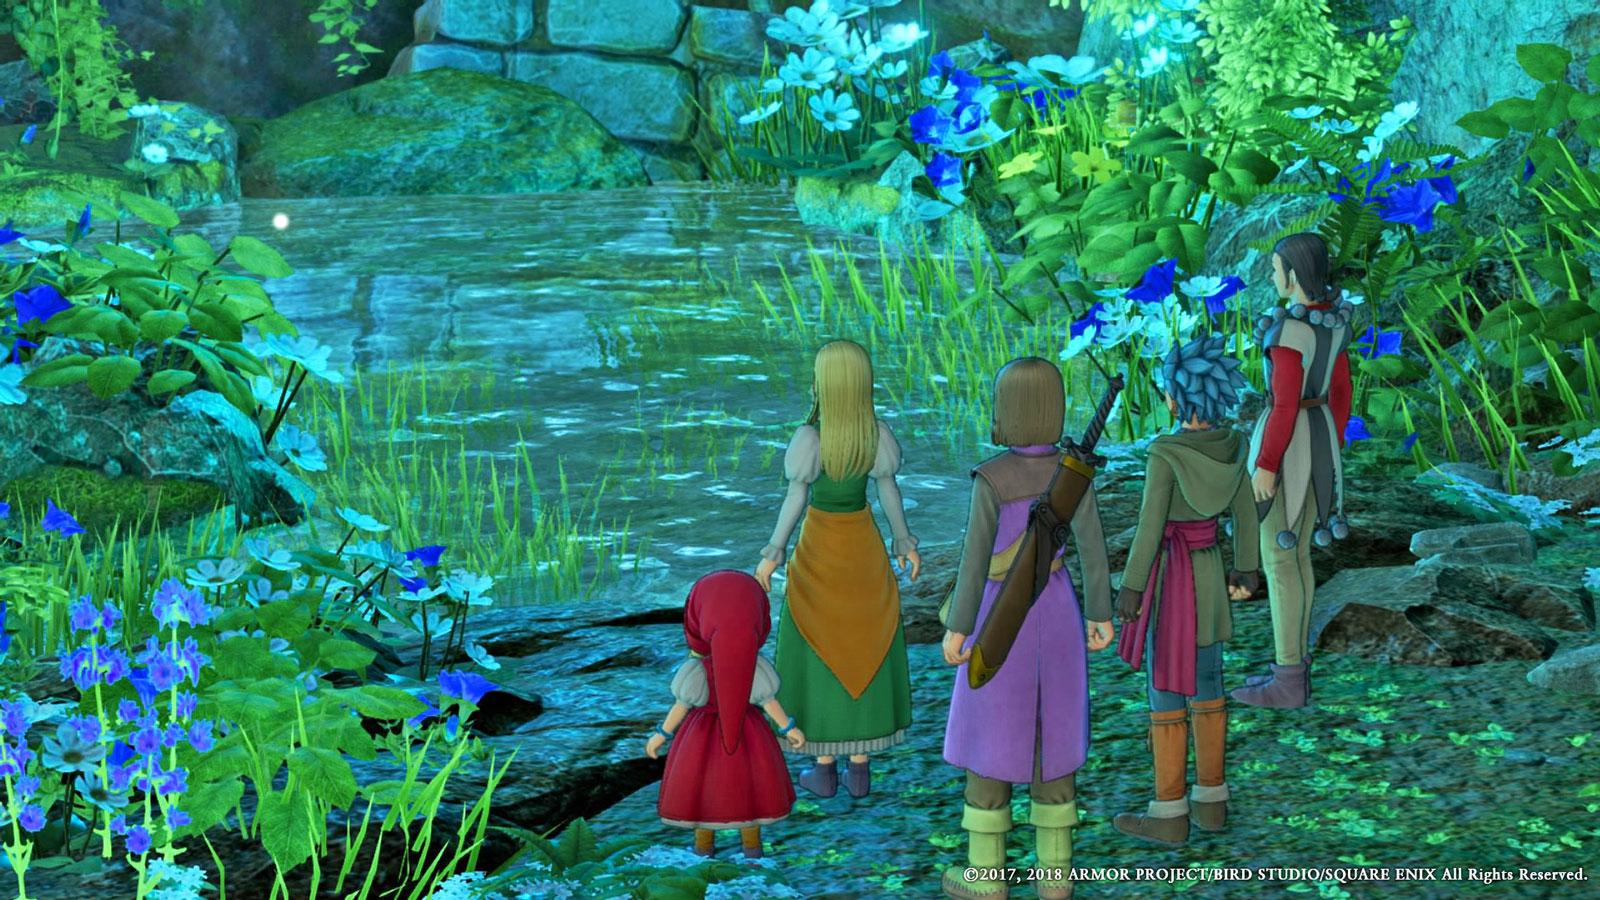 Dragon Quest Xi Wallpaper: You Need To Finish 'Dragon Quest XI'